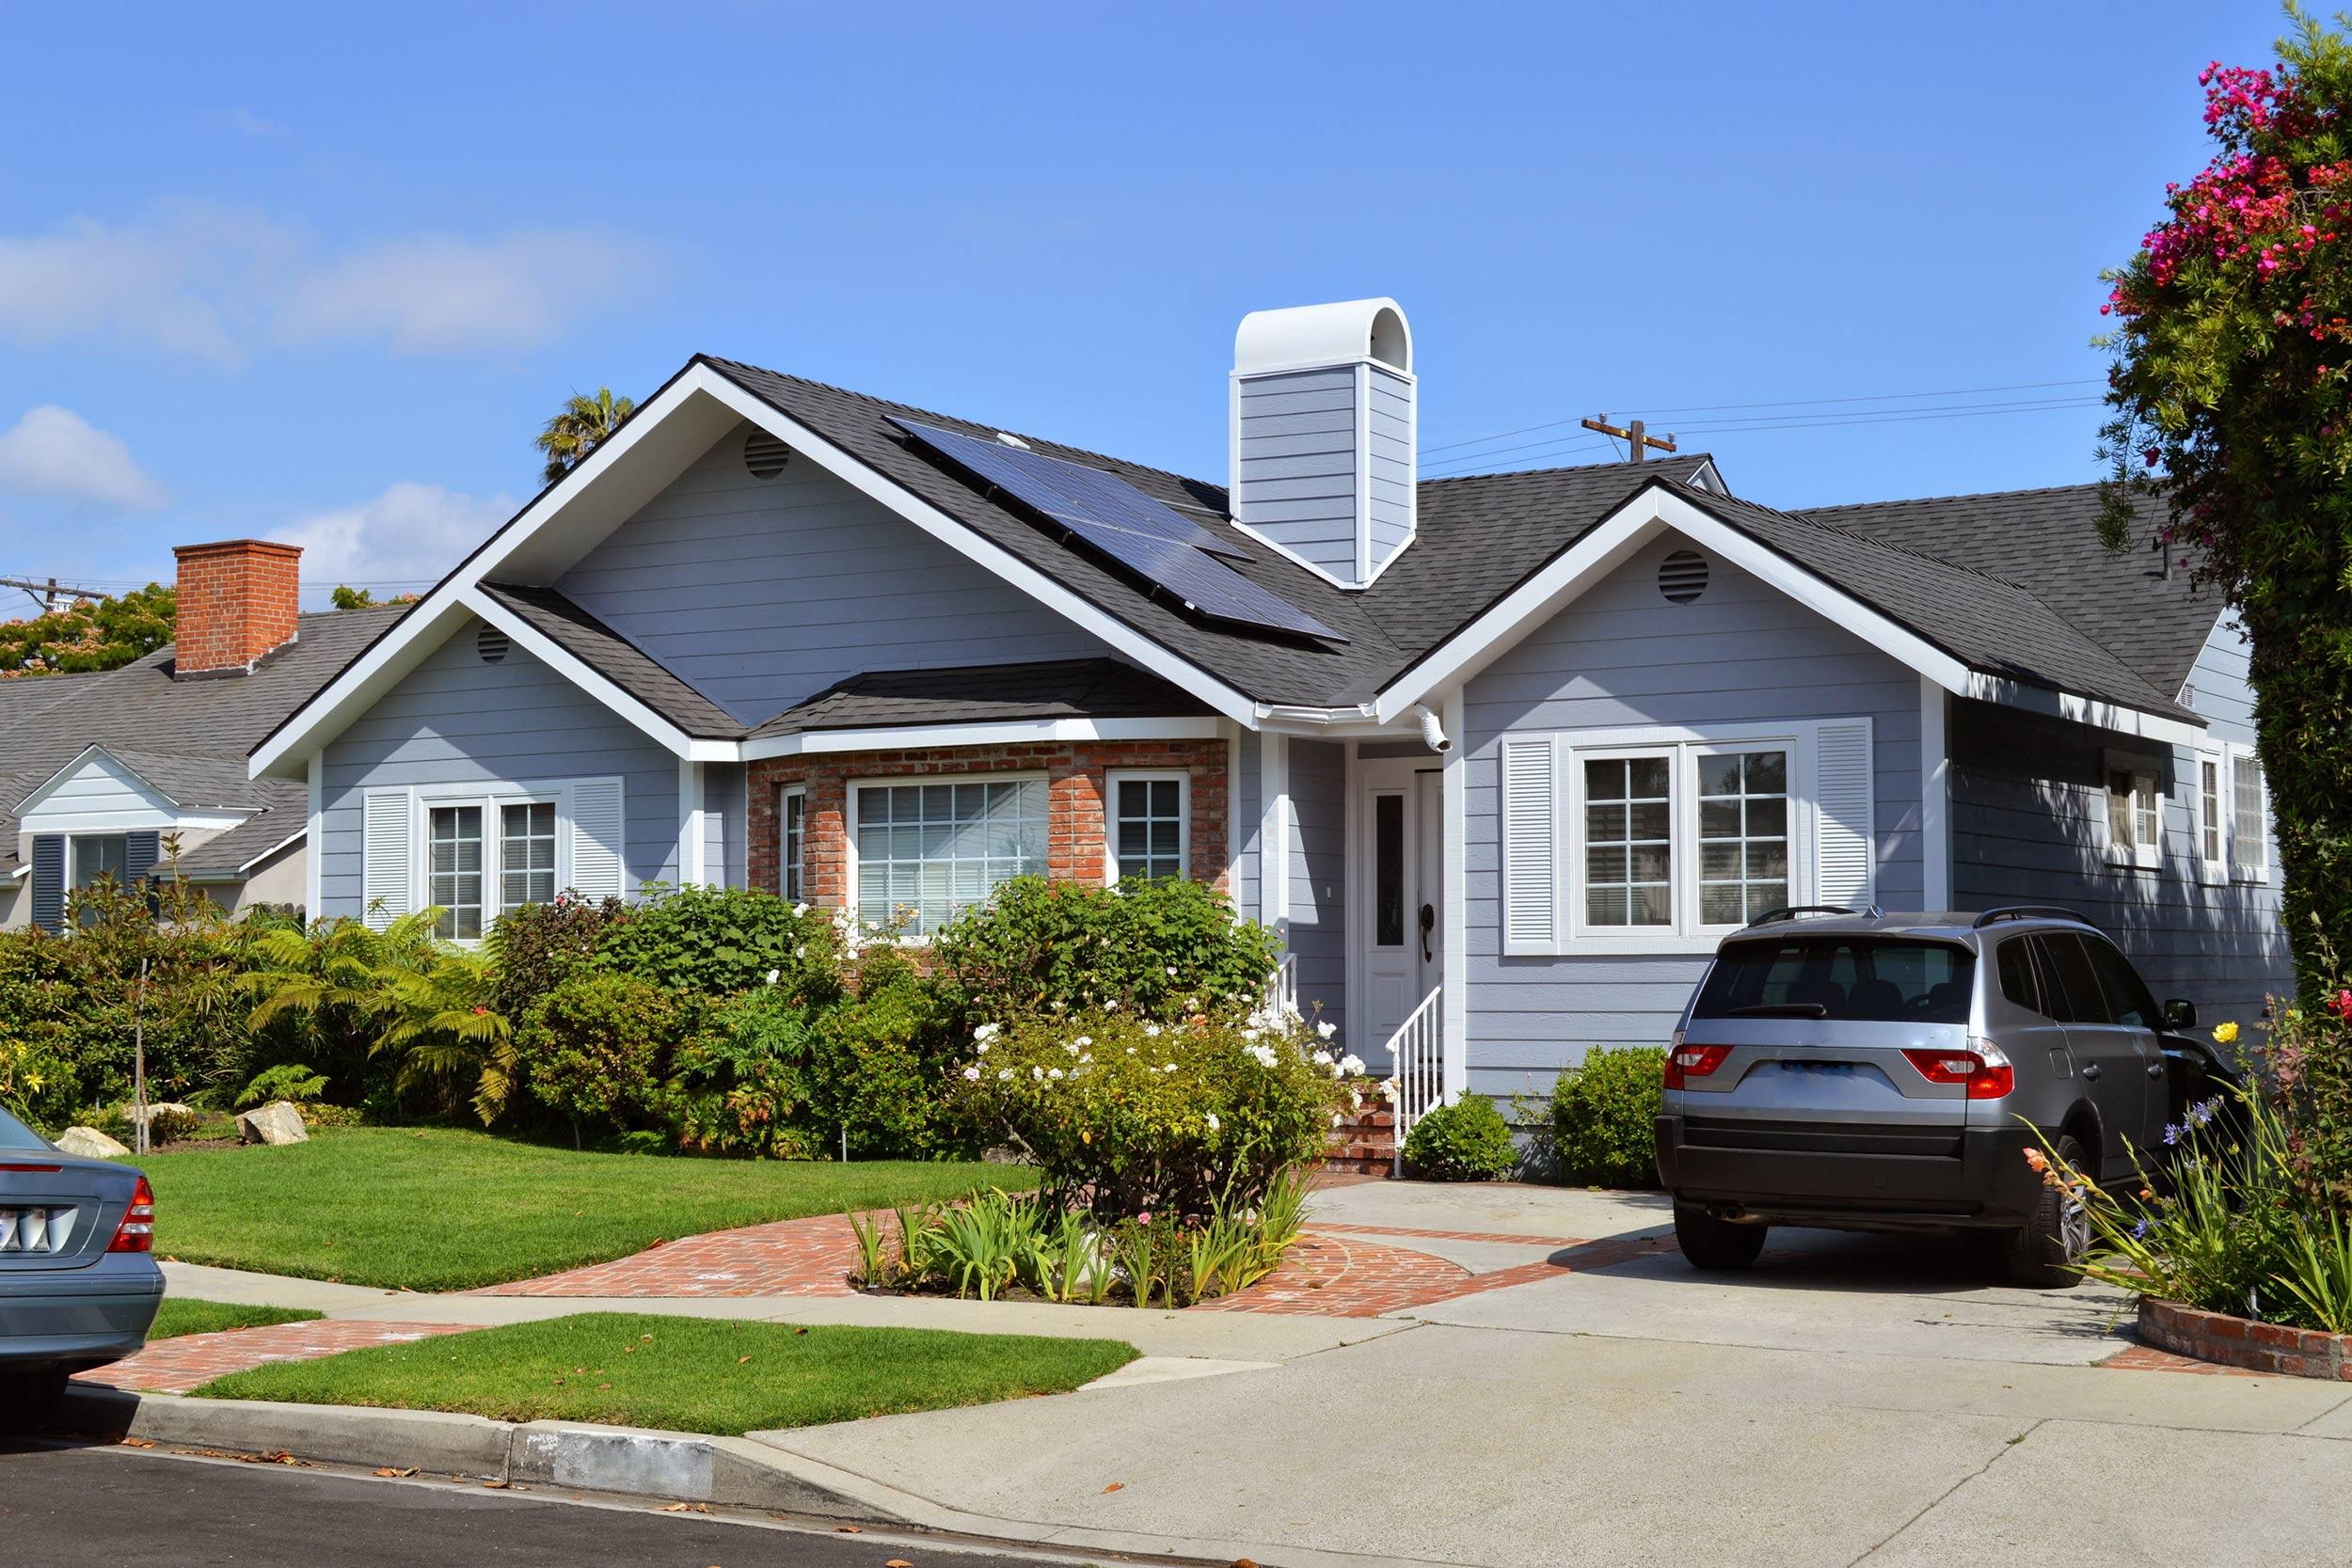 Solar Panels On New House